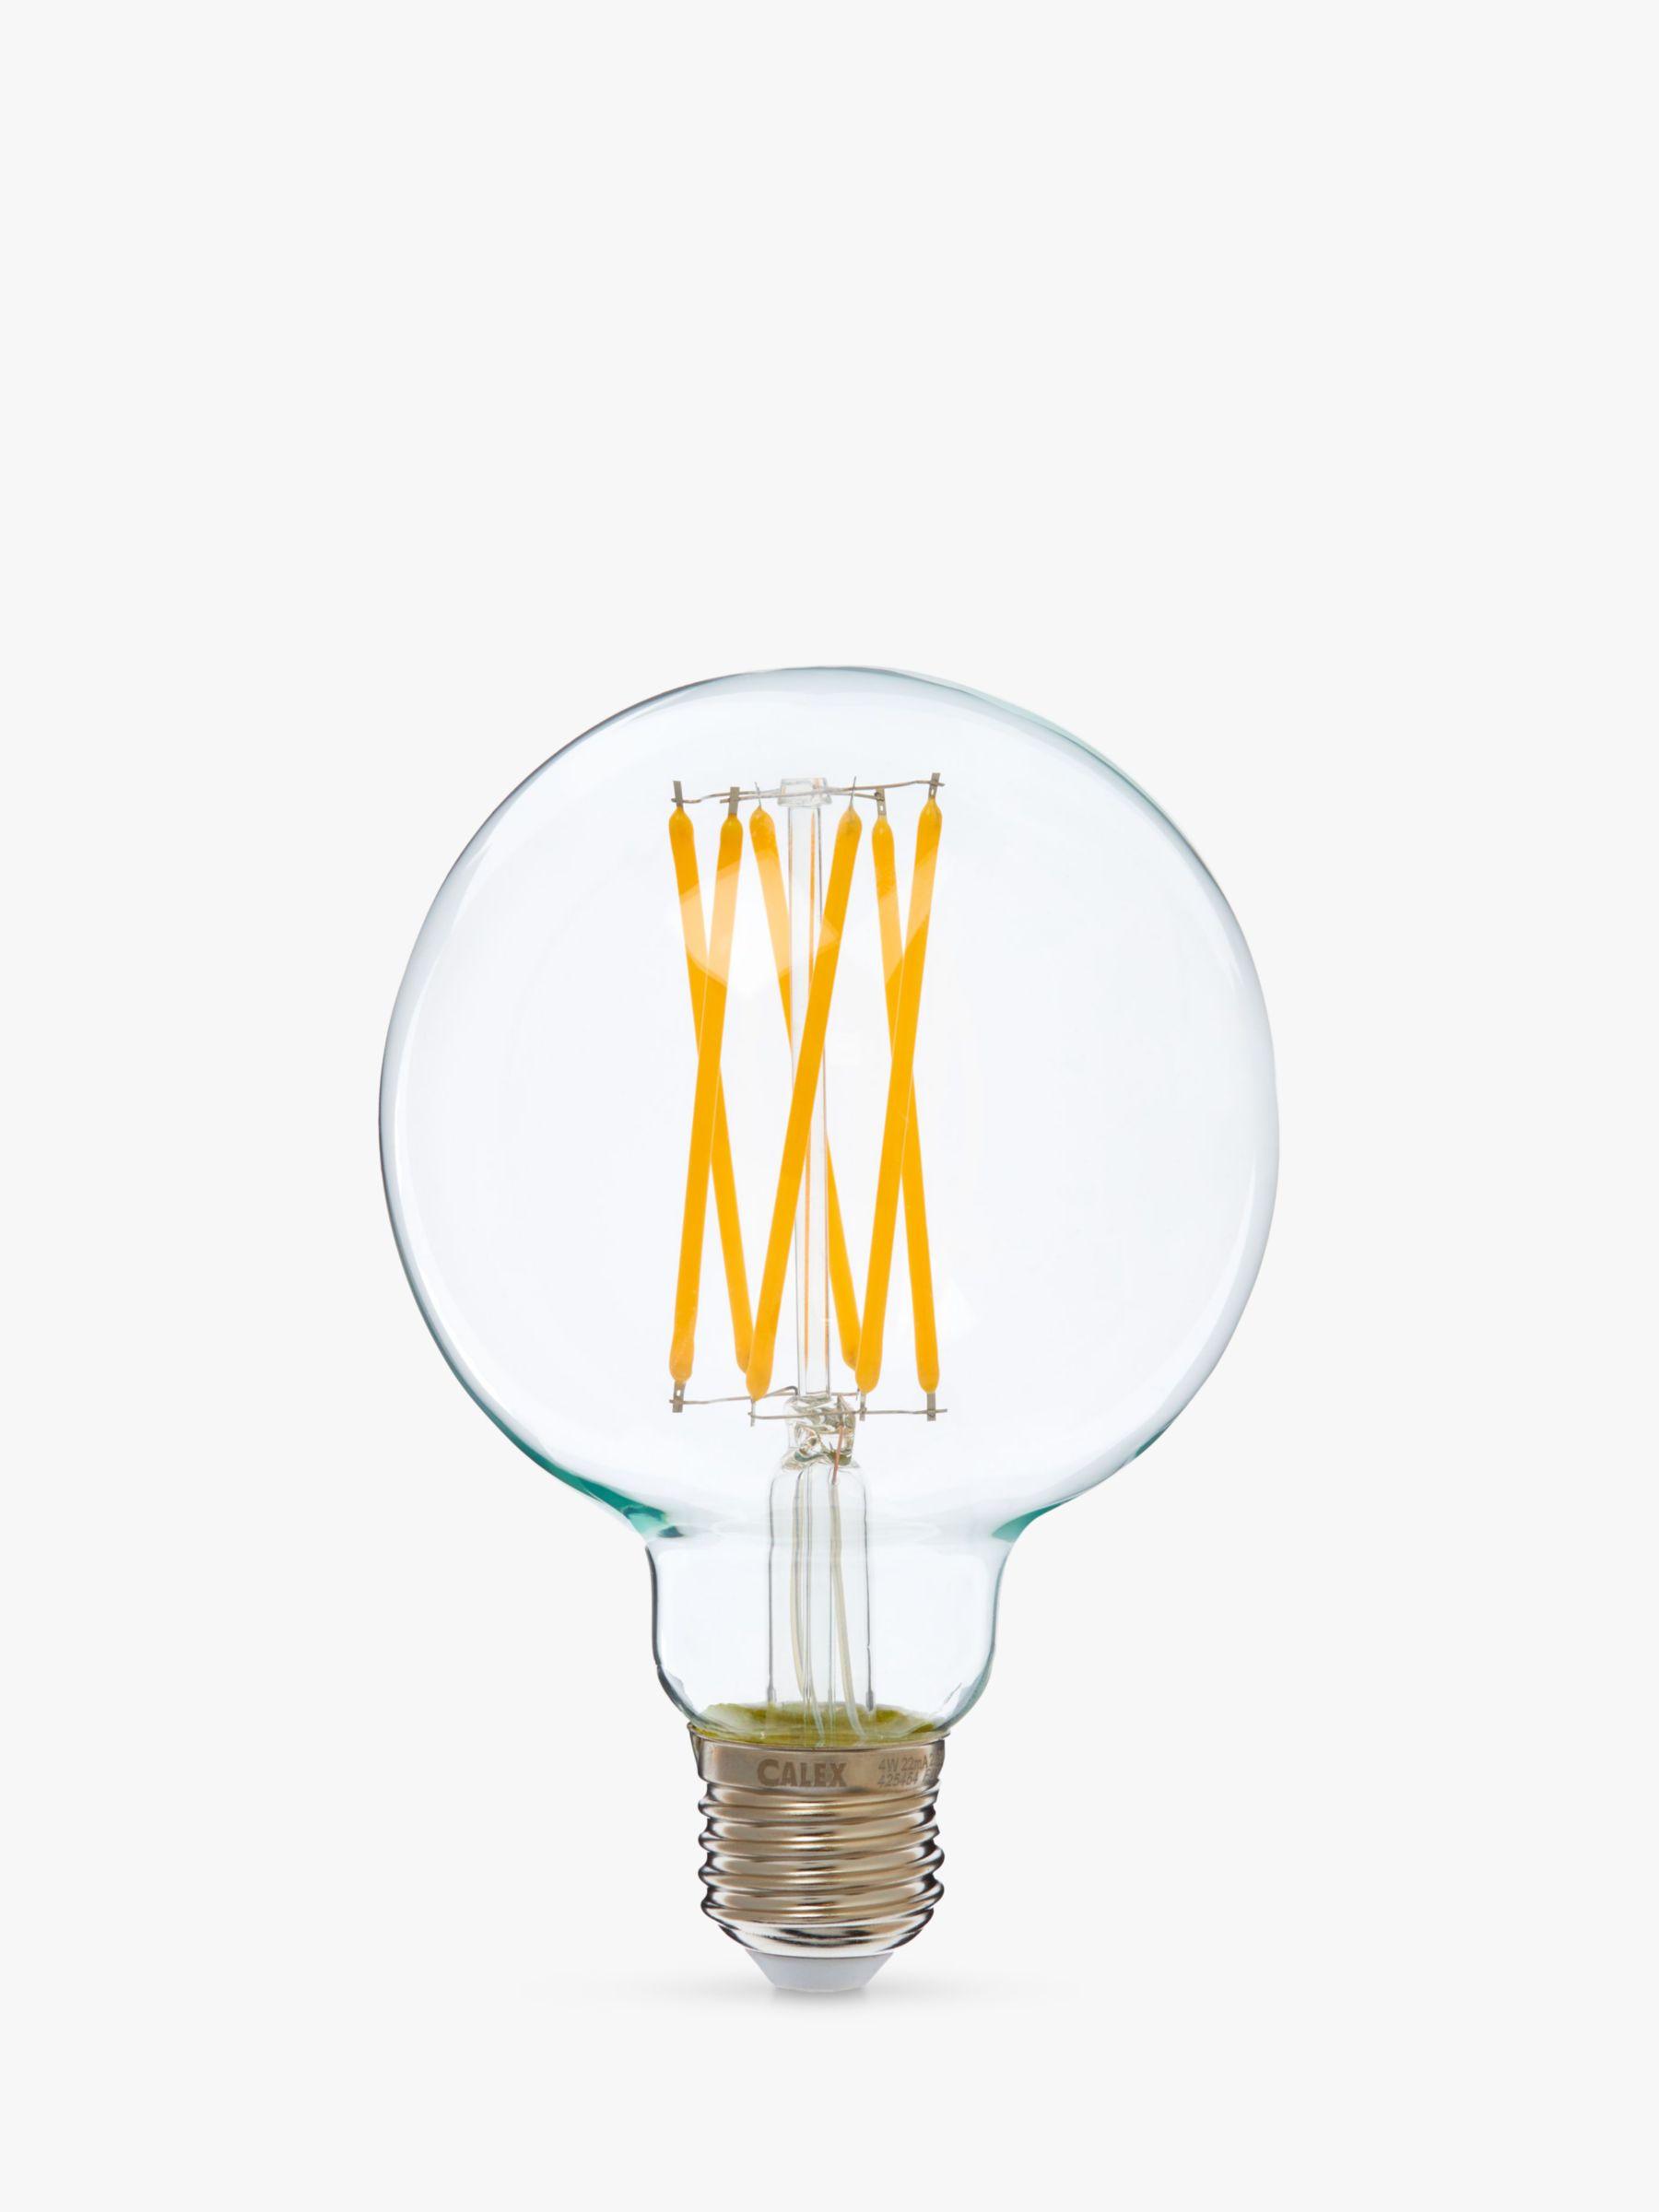 Calex Calex 4W ES LED G95 Globe Bulb, Clear, Dimmable